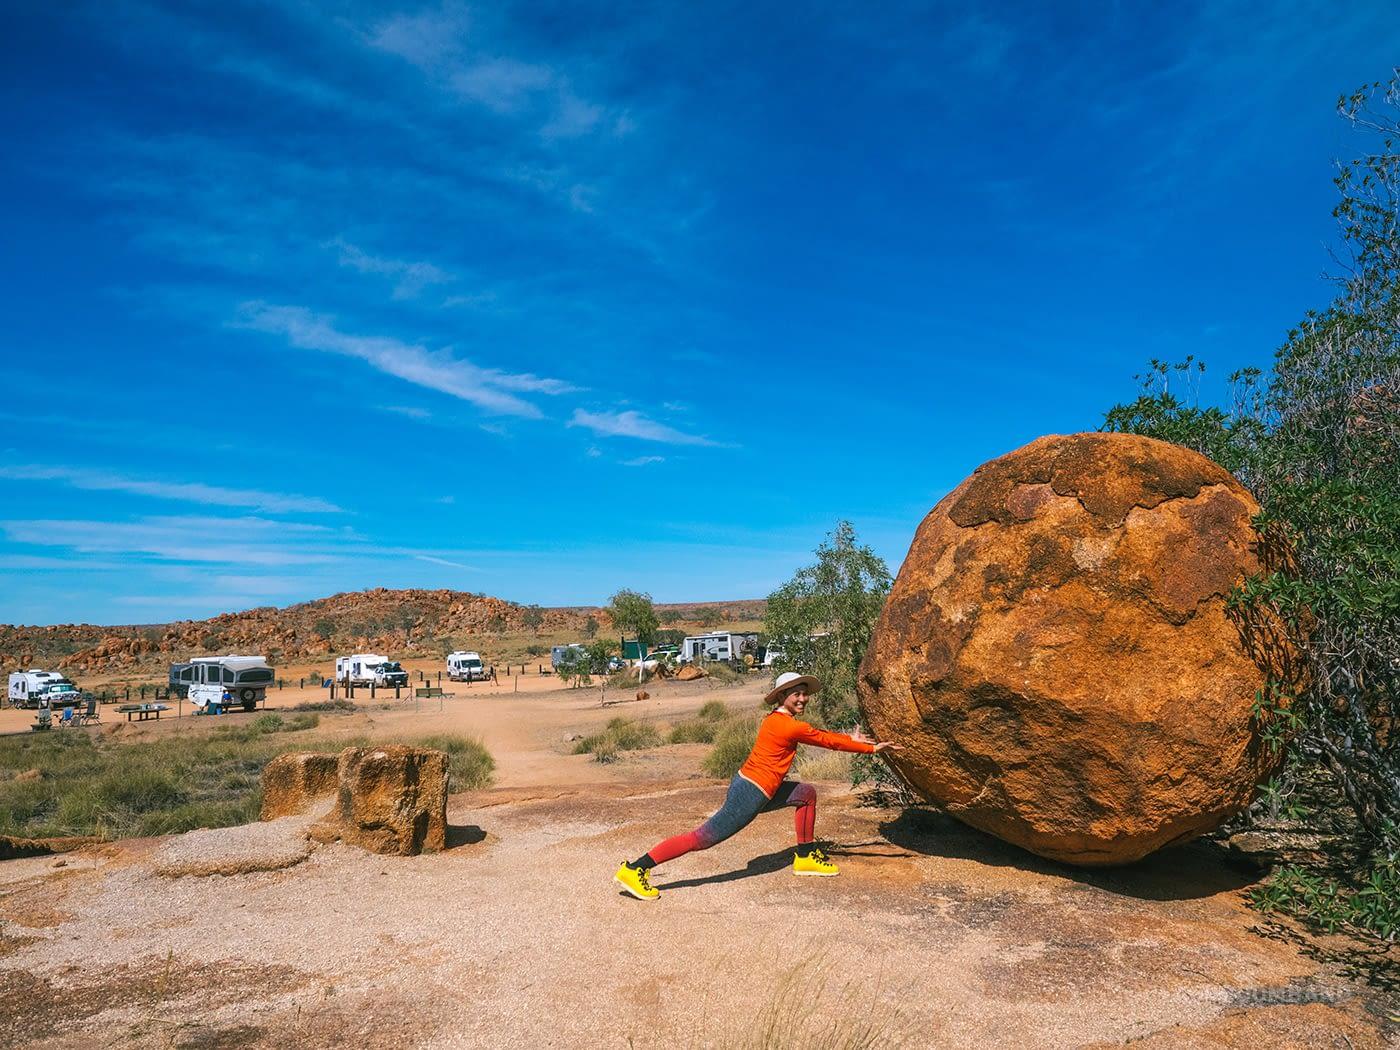 NT Australia - Karlu Karlu - E posing as if she's trying to move the boulder